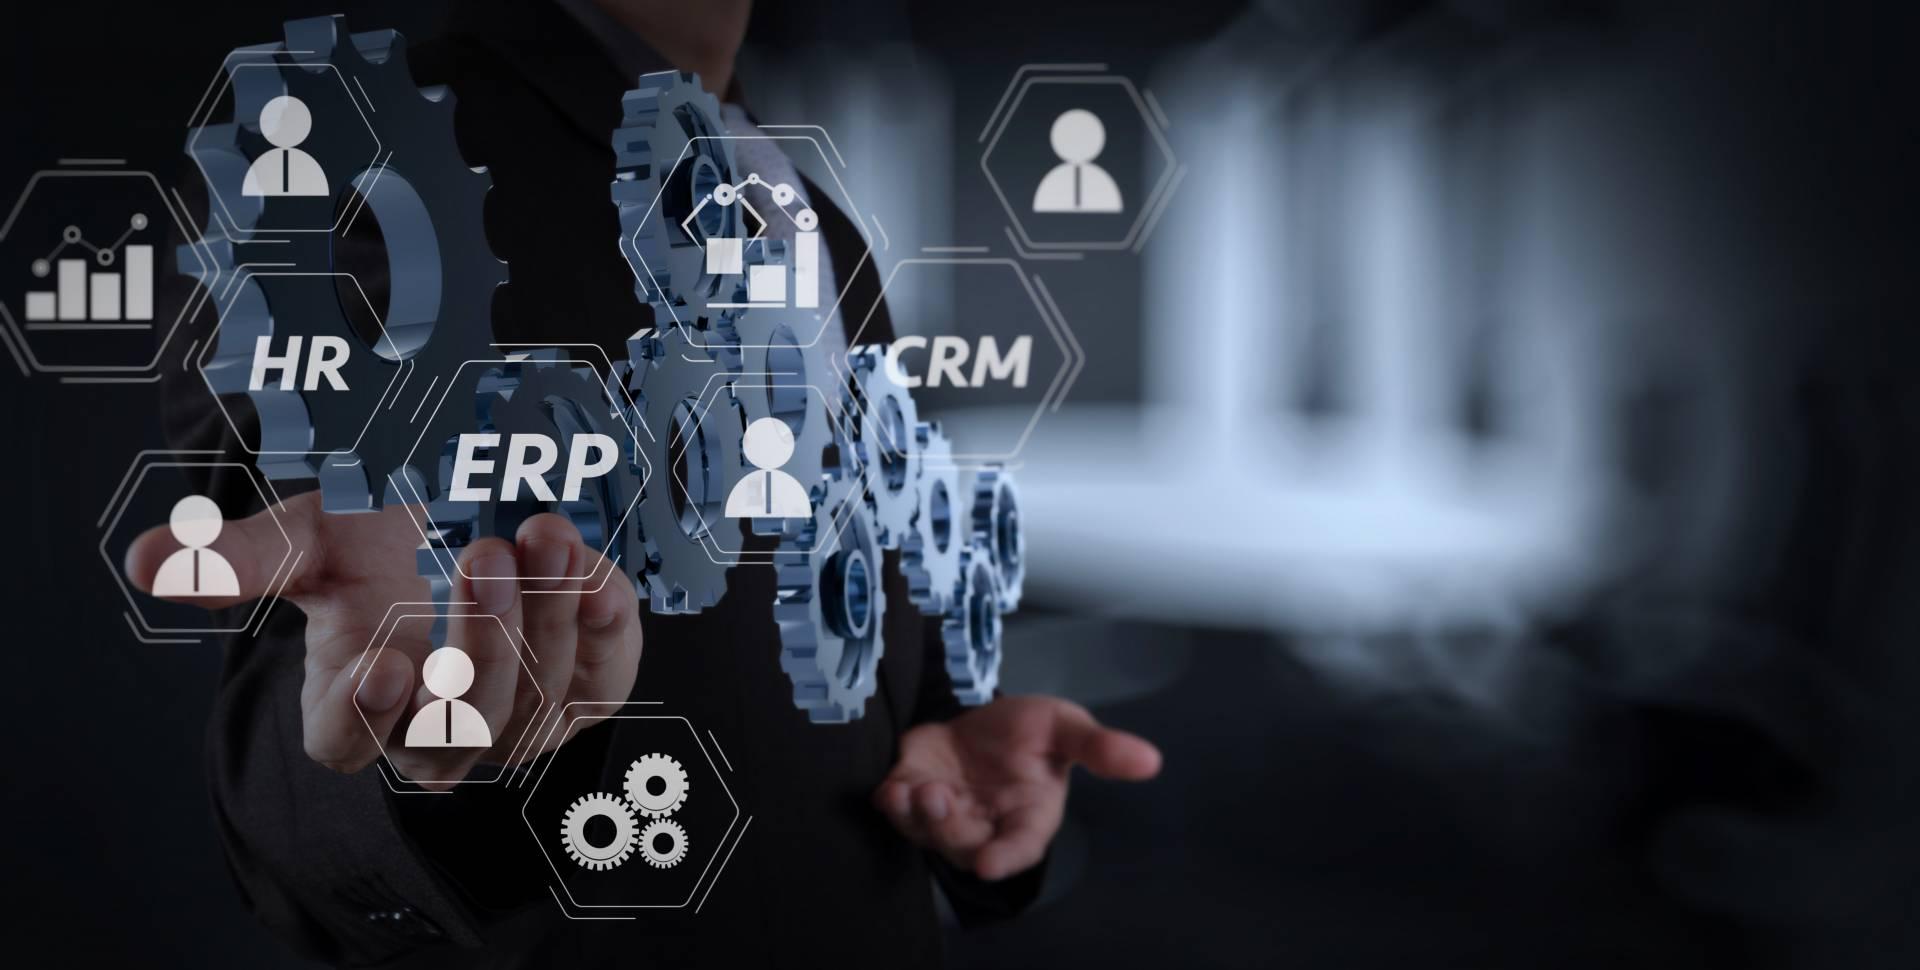 ERP λογισμικό της Softone